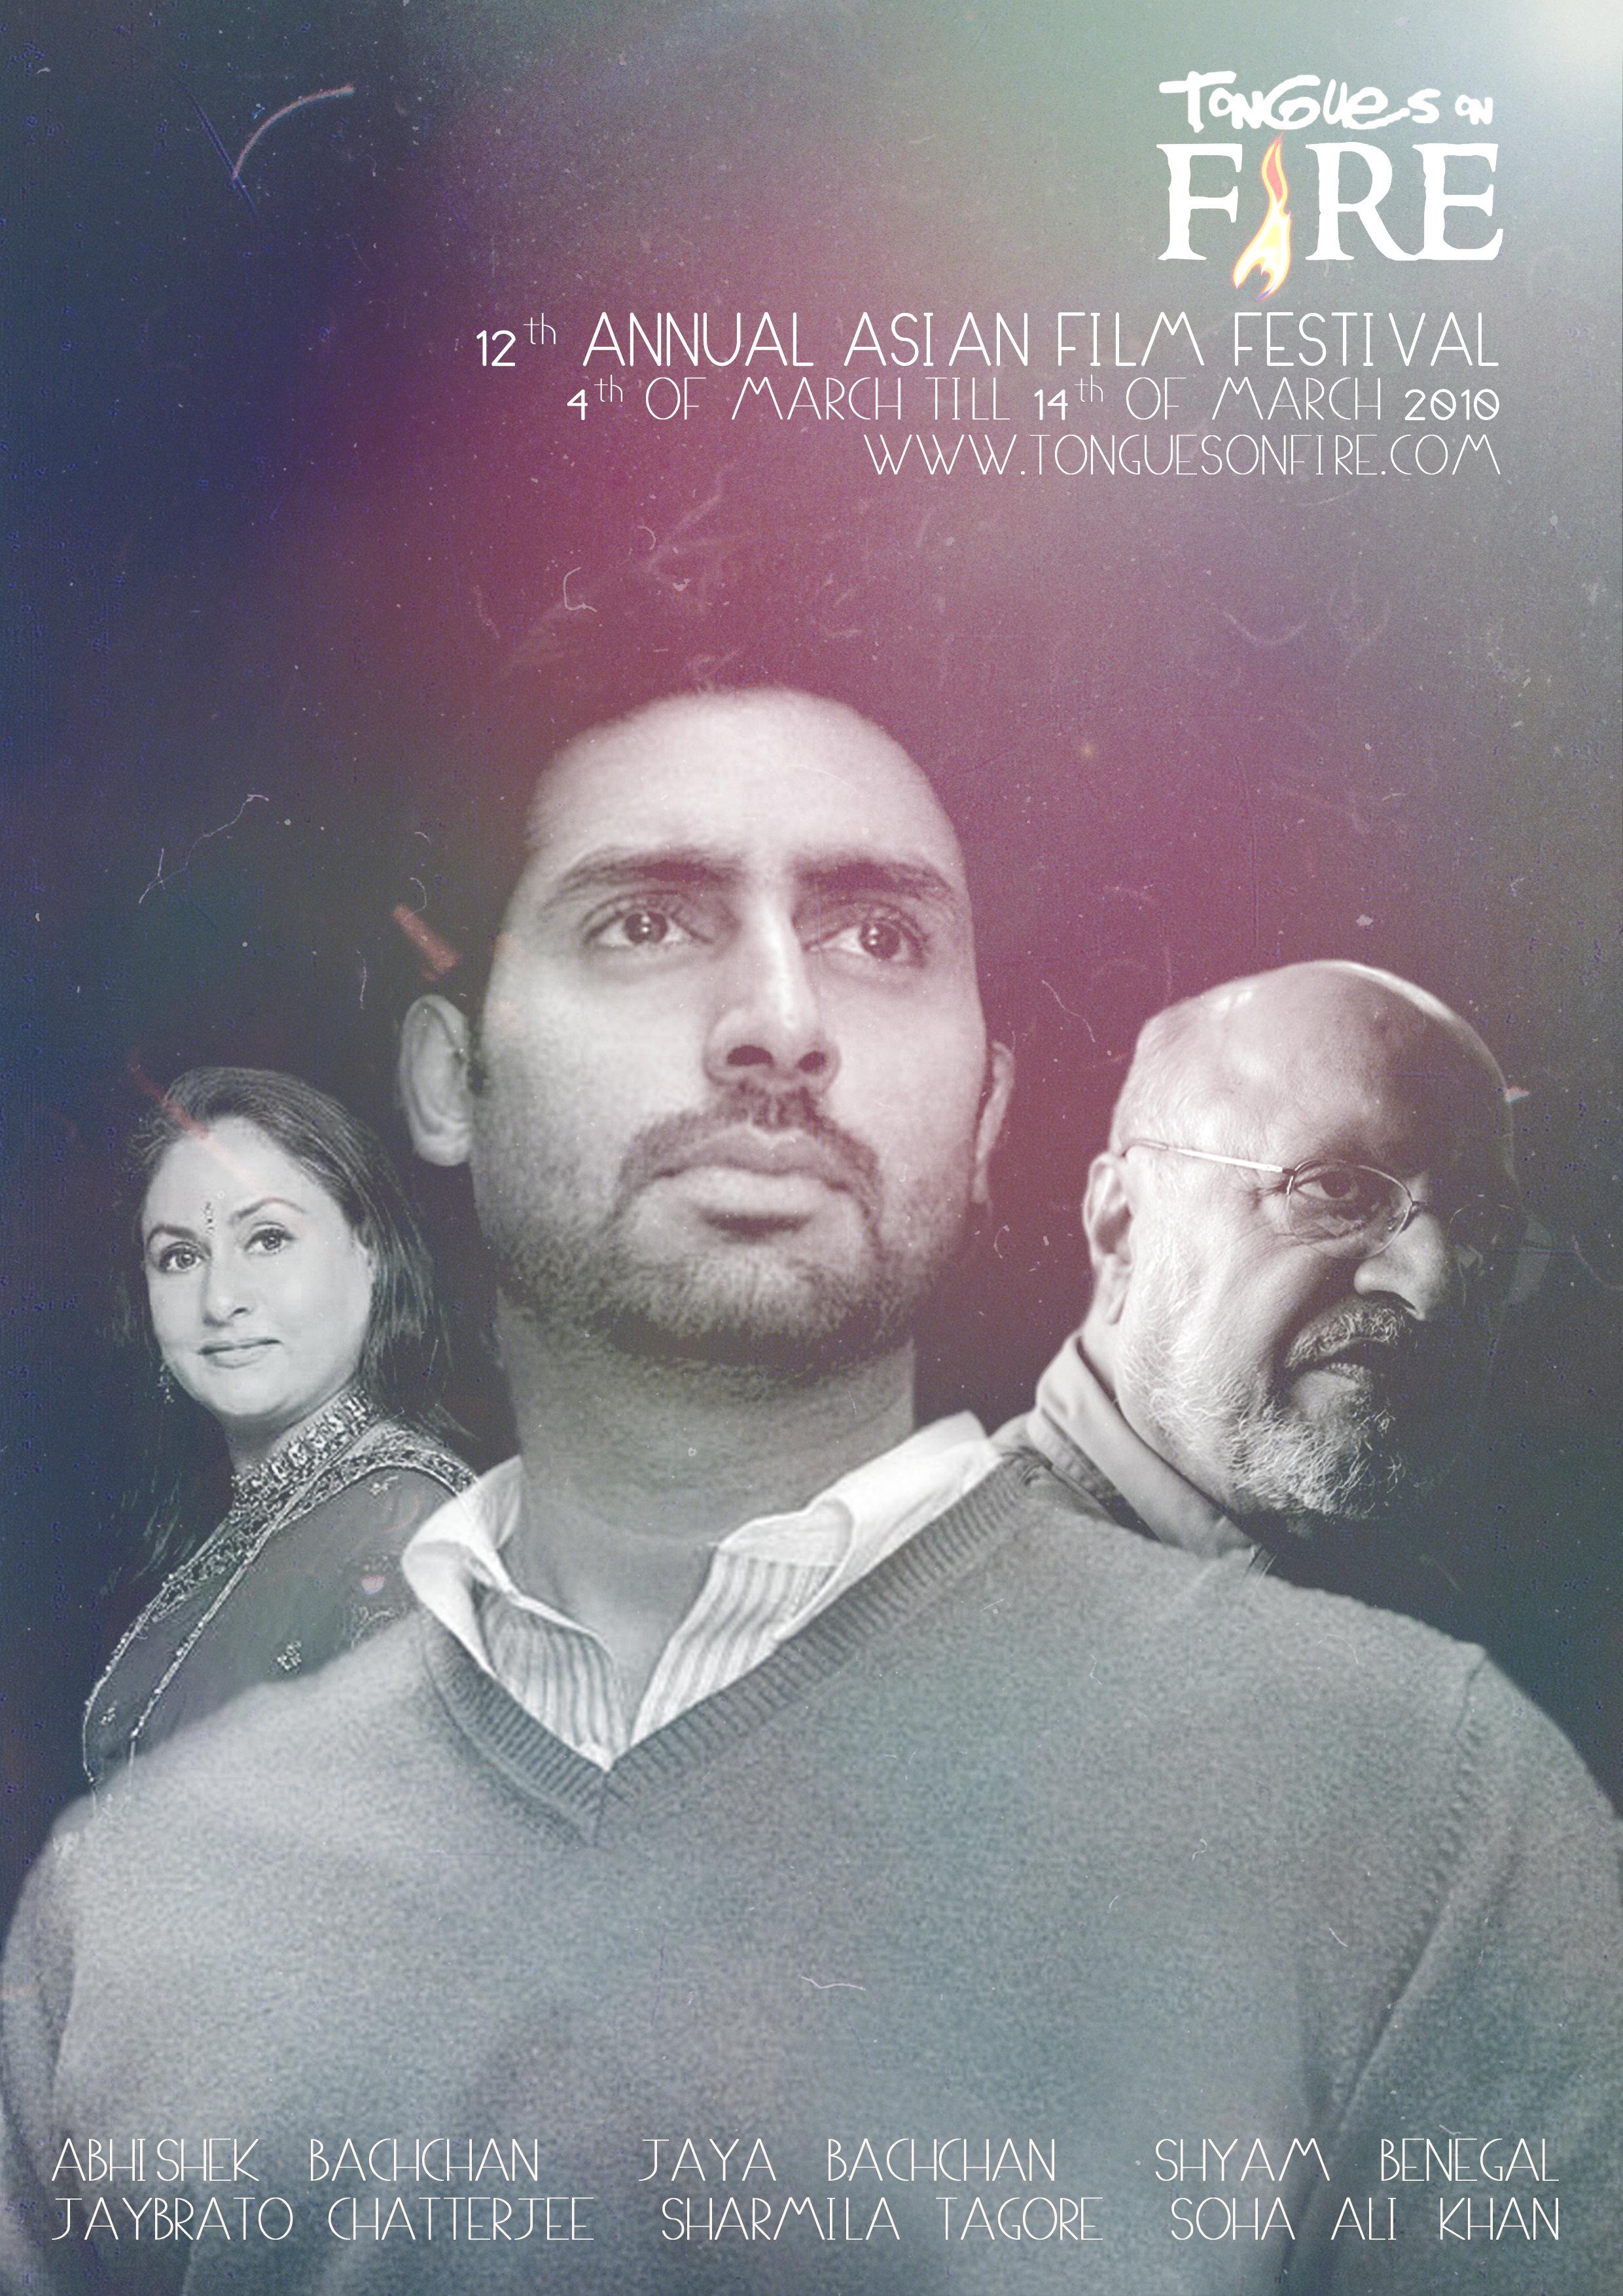 London Indian Film Festival 2010 poster